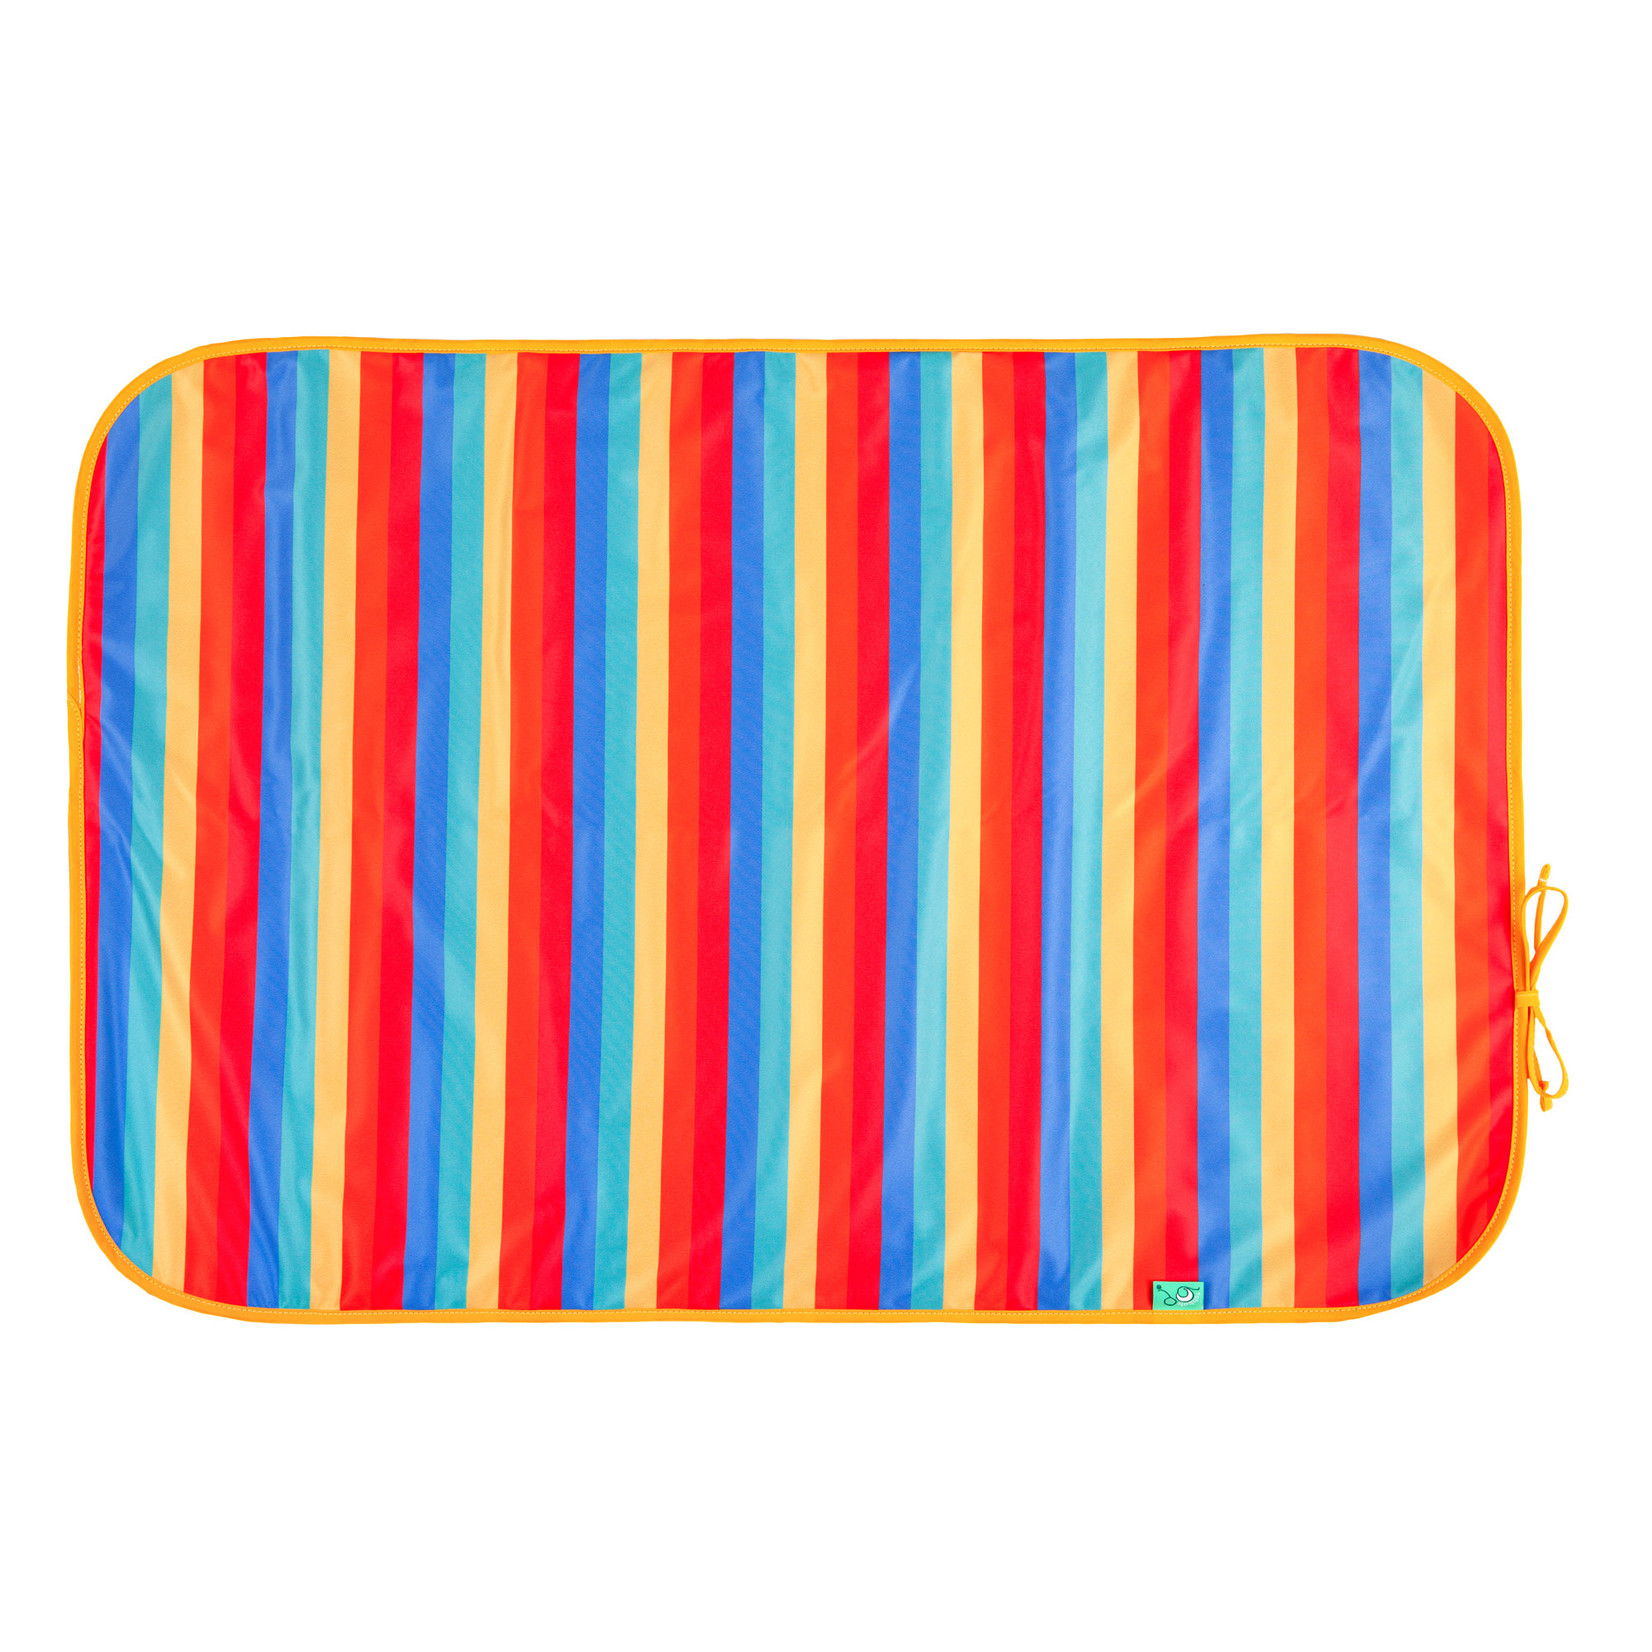 Totsbots Happy mat (Rainbow Stripe)